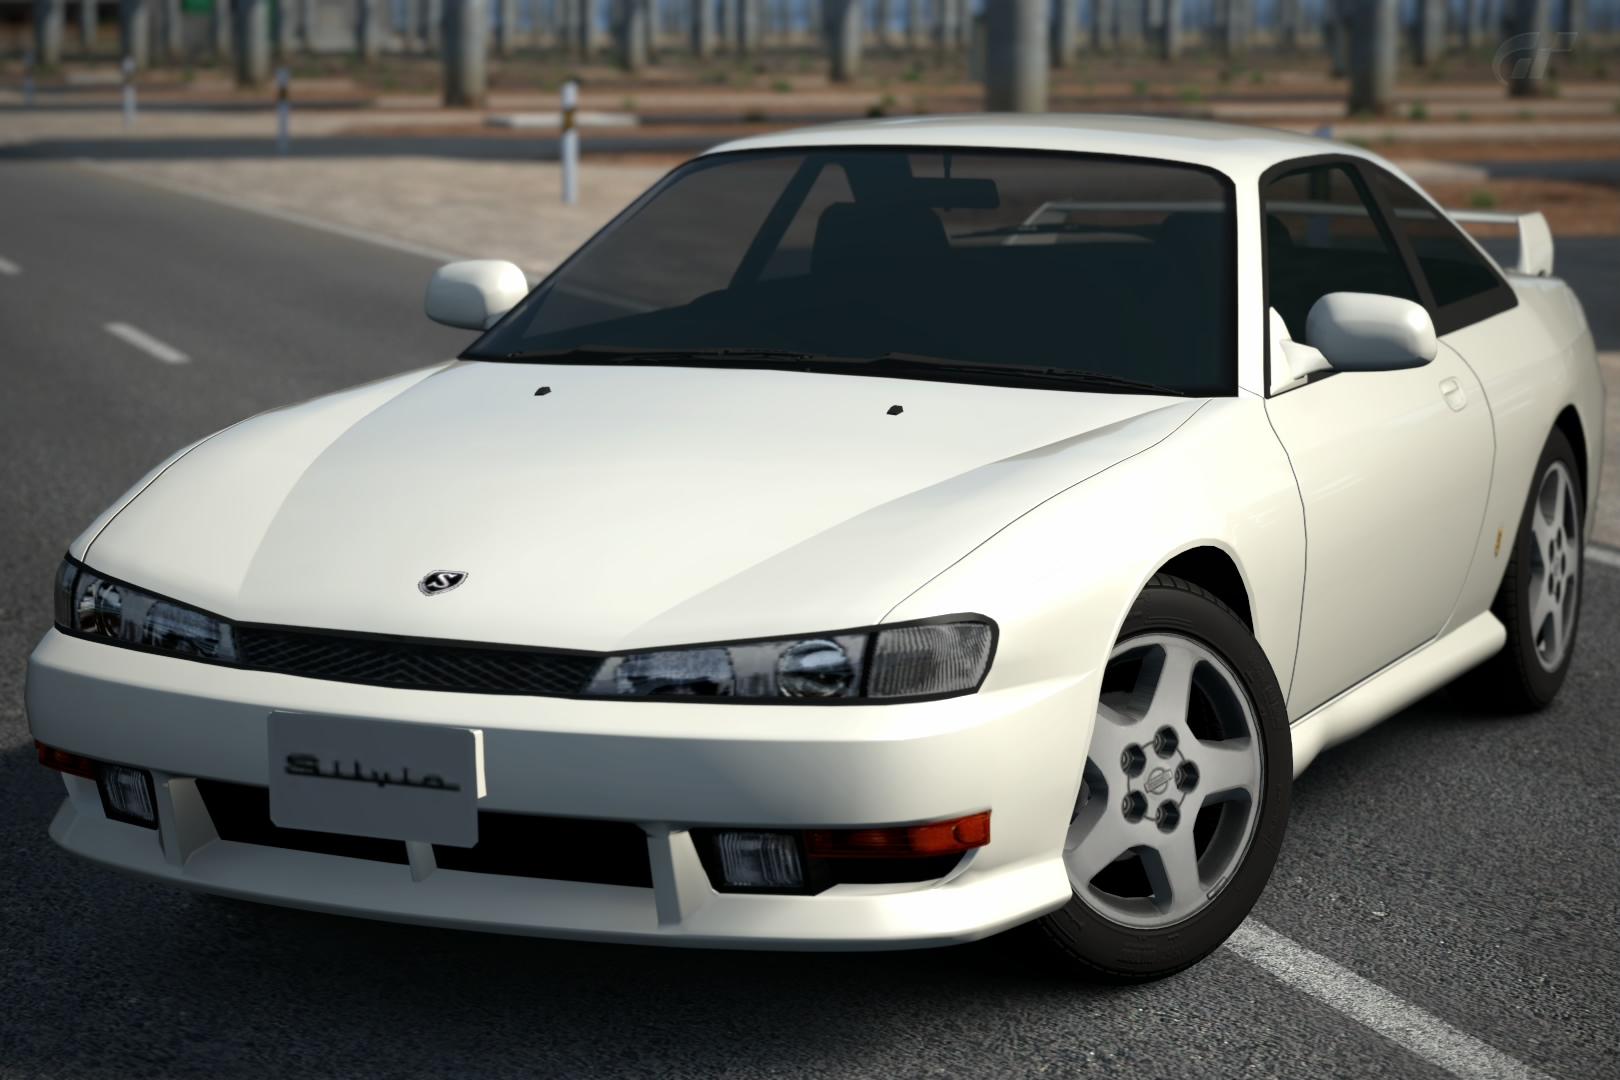 Nissan Silvia K S Aero S14 96 Gran Turismo Wiki Fandom